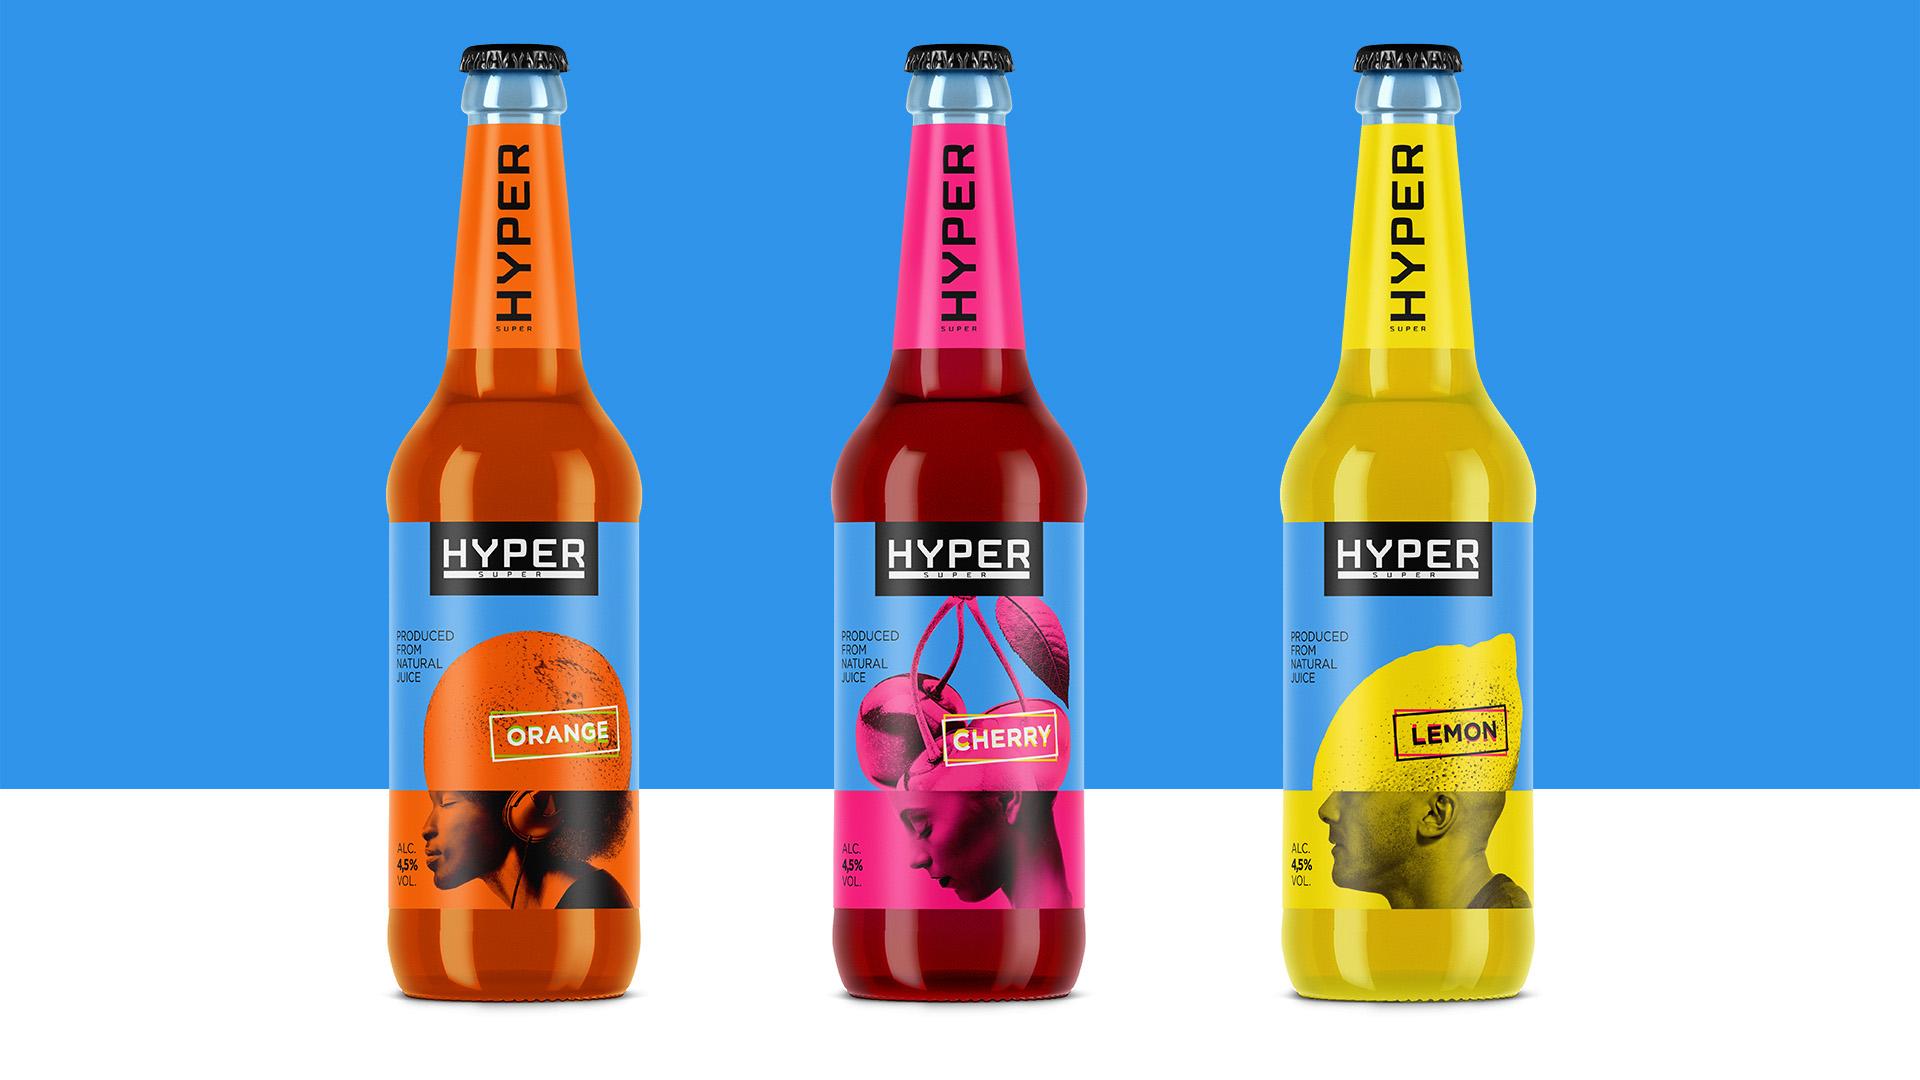 Асгард Брендинг, упаковка, брендинг, апельсин, вишня, лимон, голова, оранжевый, магента, напиток, Hyper, magenta, head, design, packaging, Asgard branding, HomoFructus